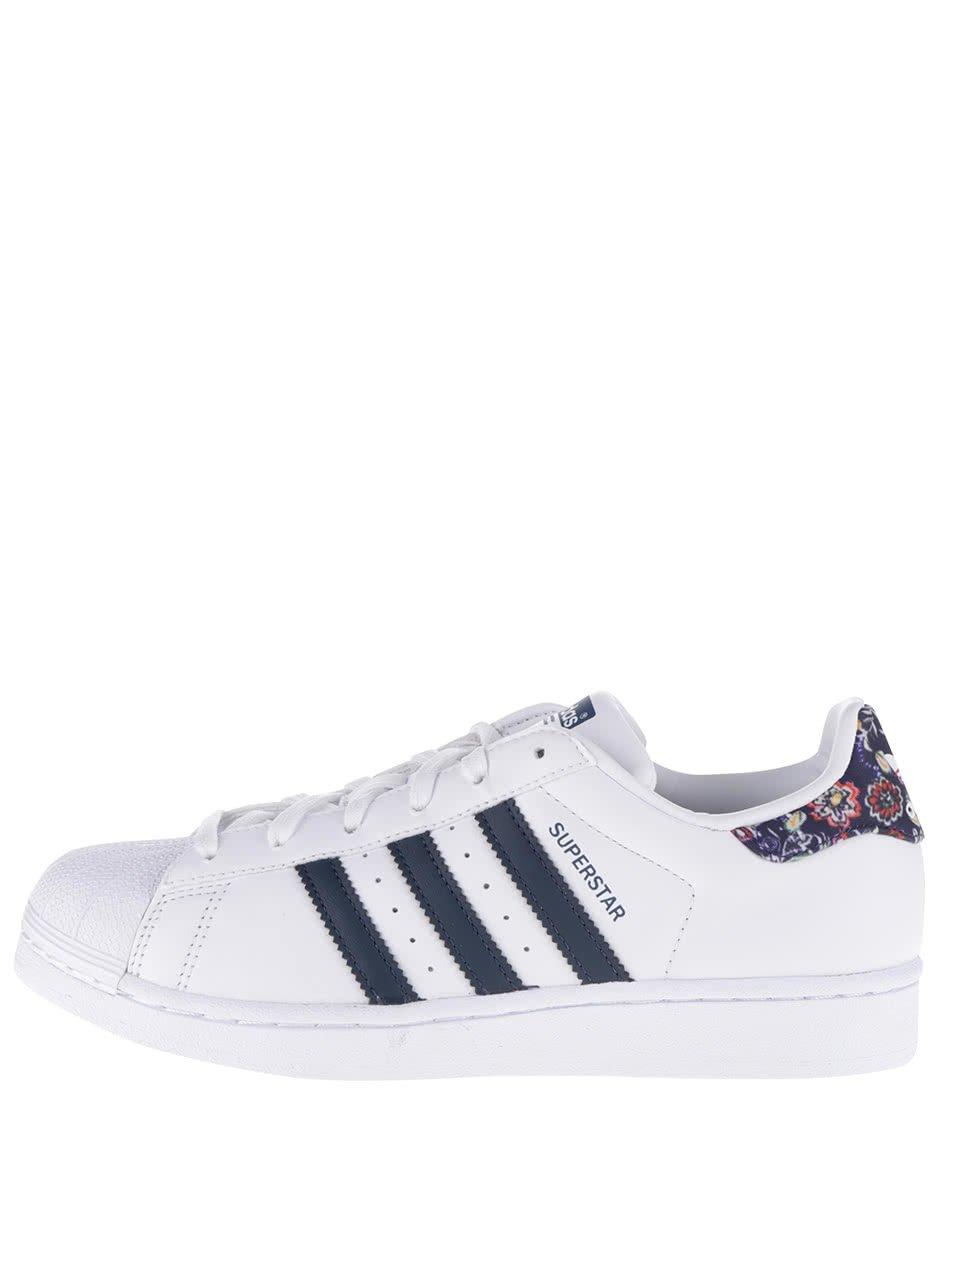 Bílé dámské tenisky s barevnou patou adidas Originals Superstar